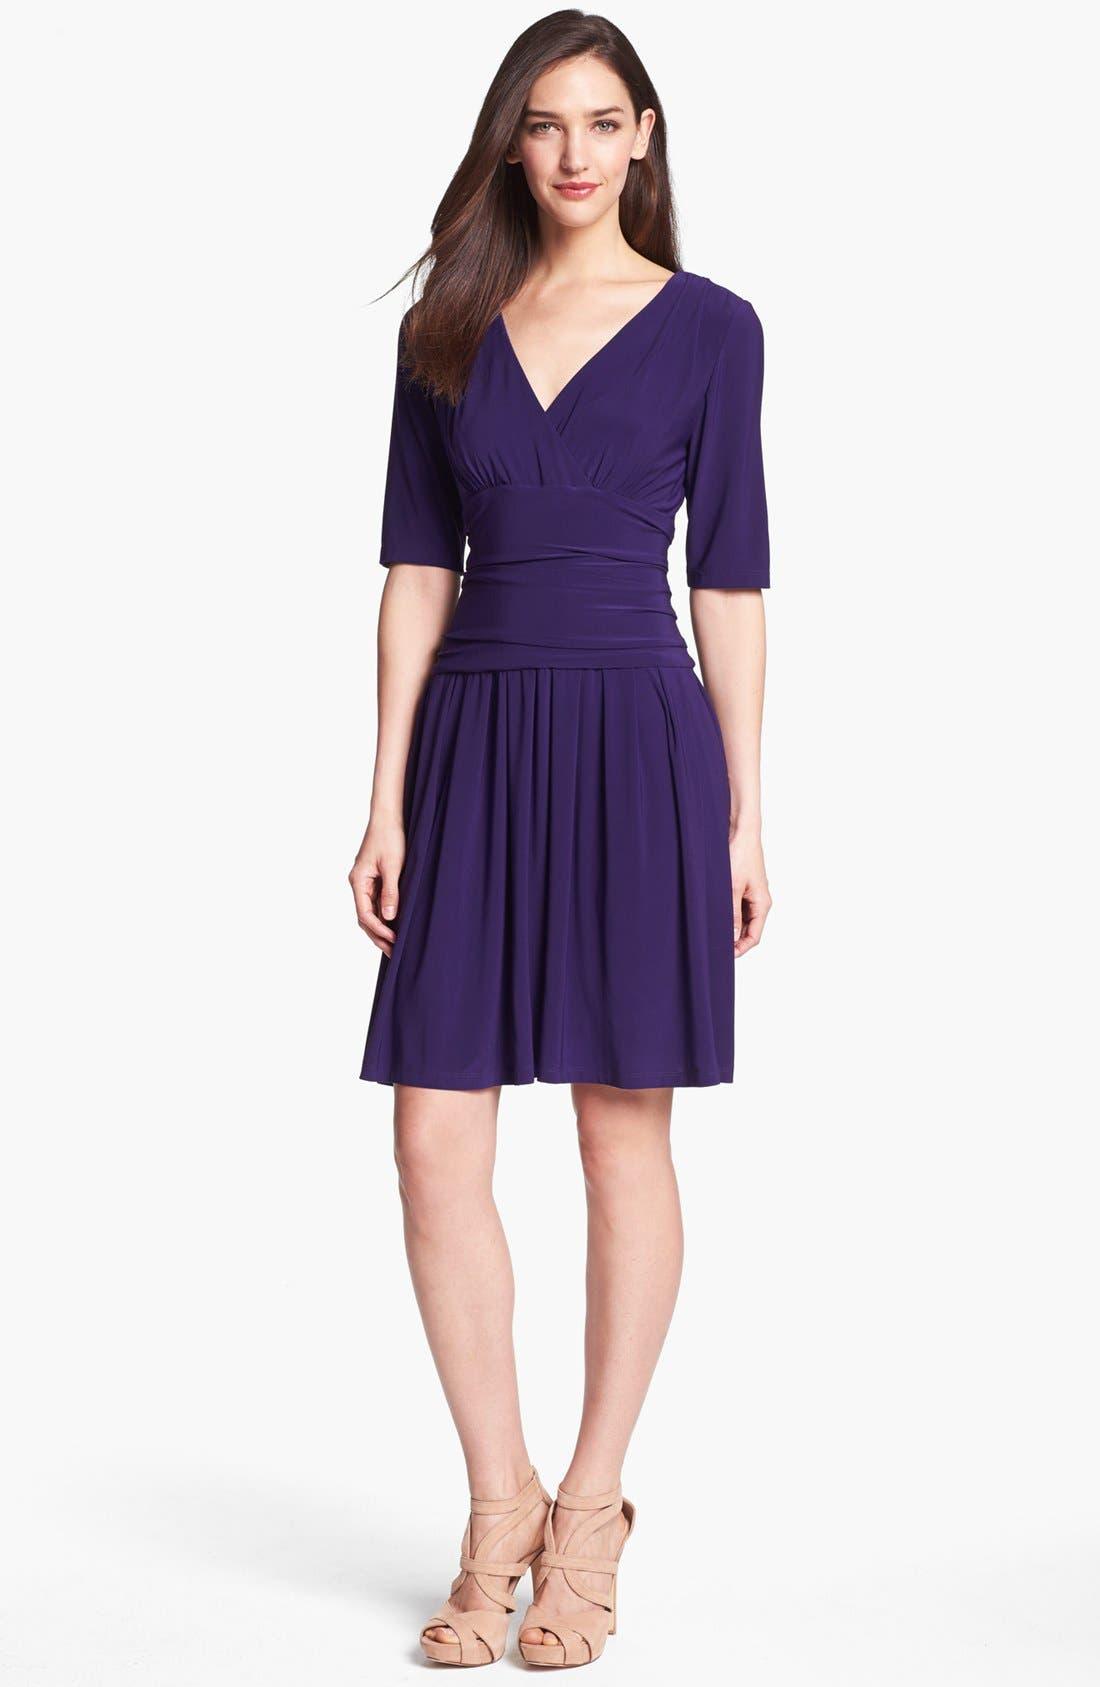 Alternate Image 1 Selected - Eliza J Jersey Fit & Flare Dress (Online Only)